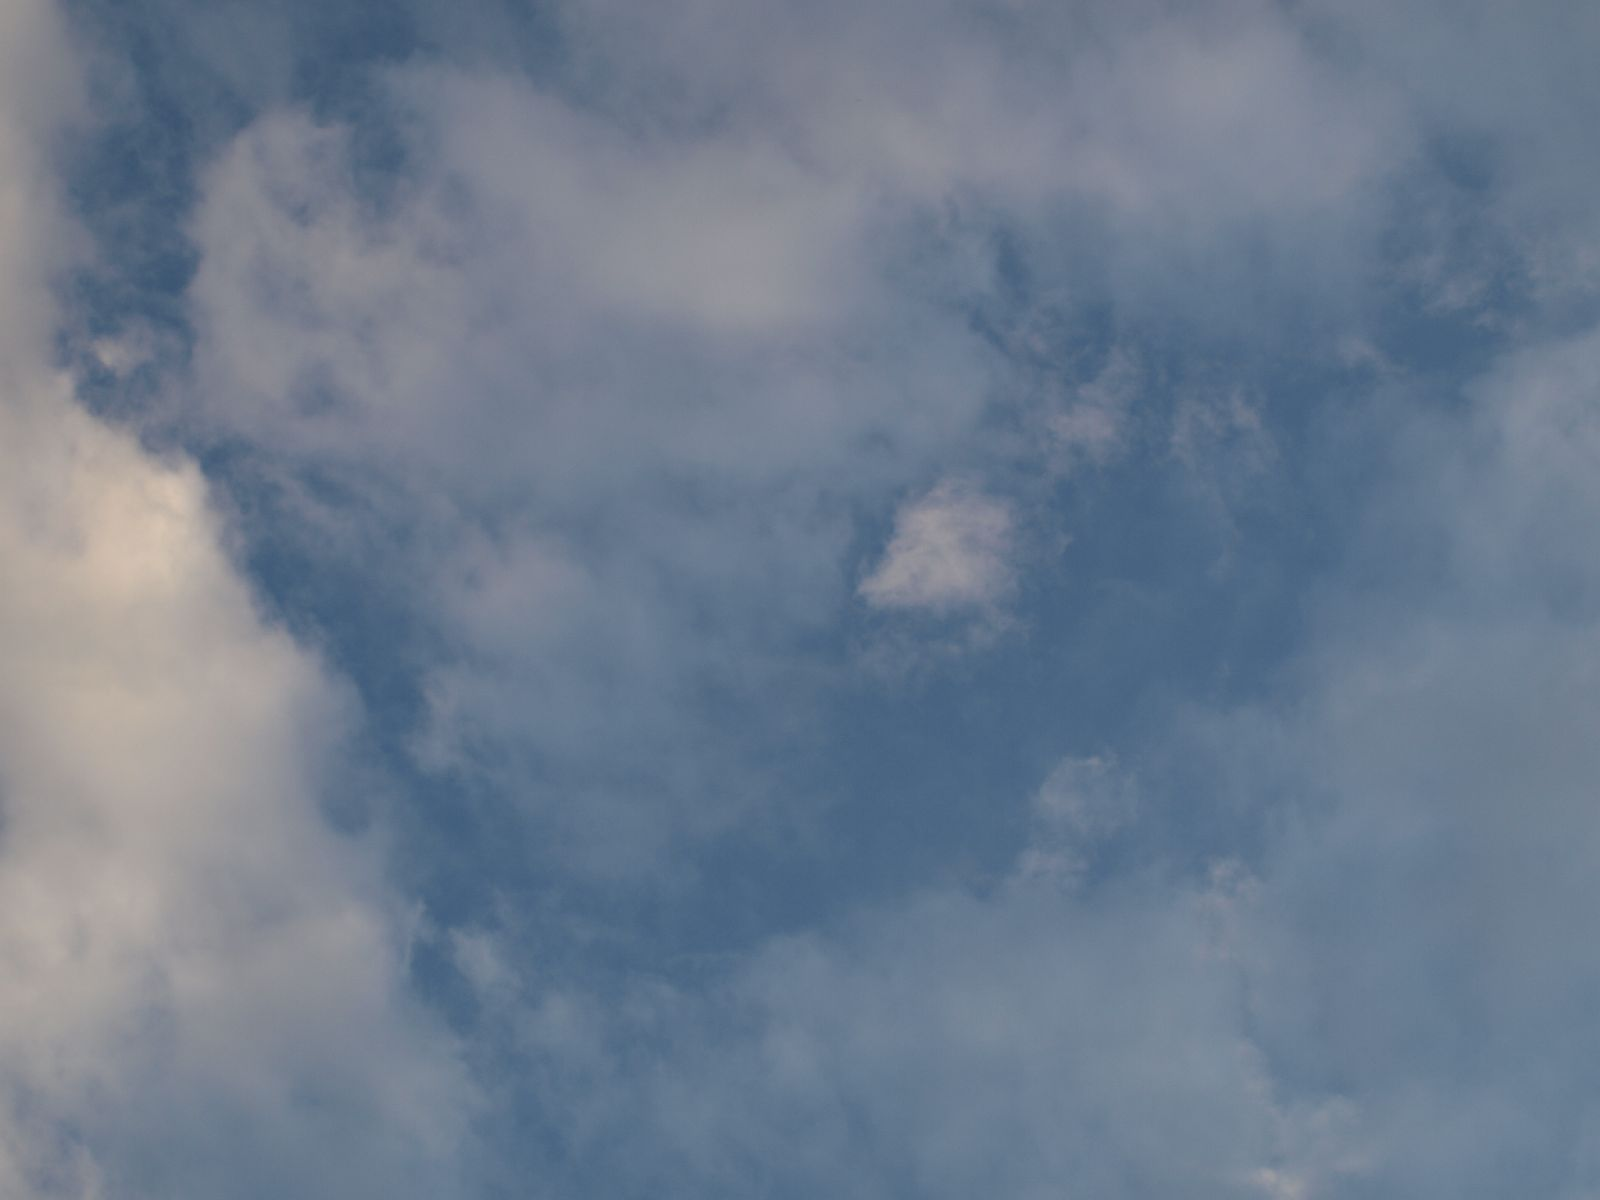 Himmel-Wolken-Foto_Textur_A_PA110191